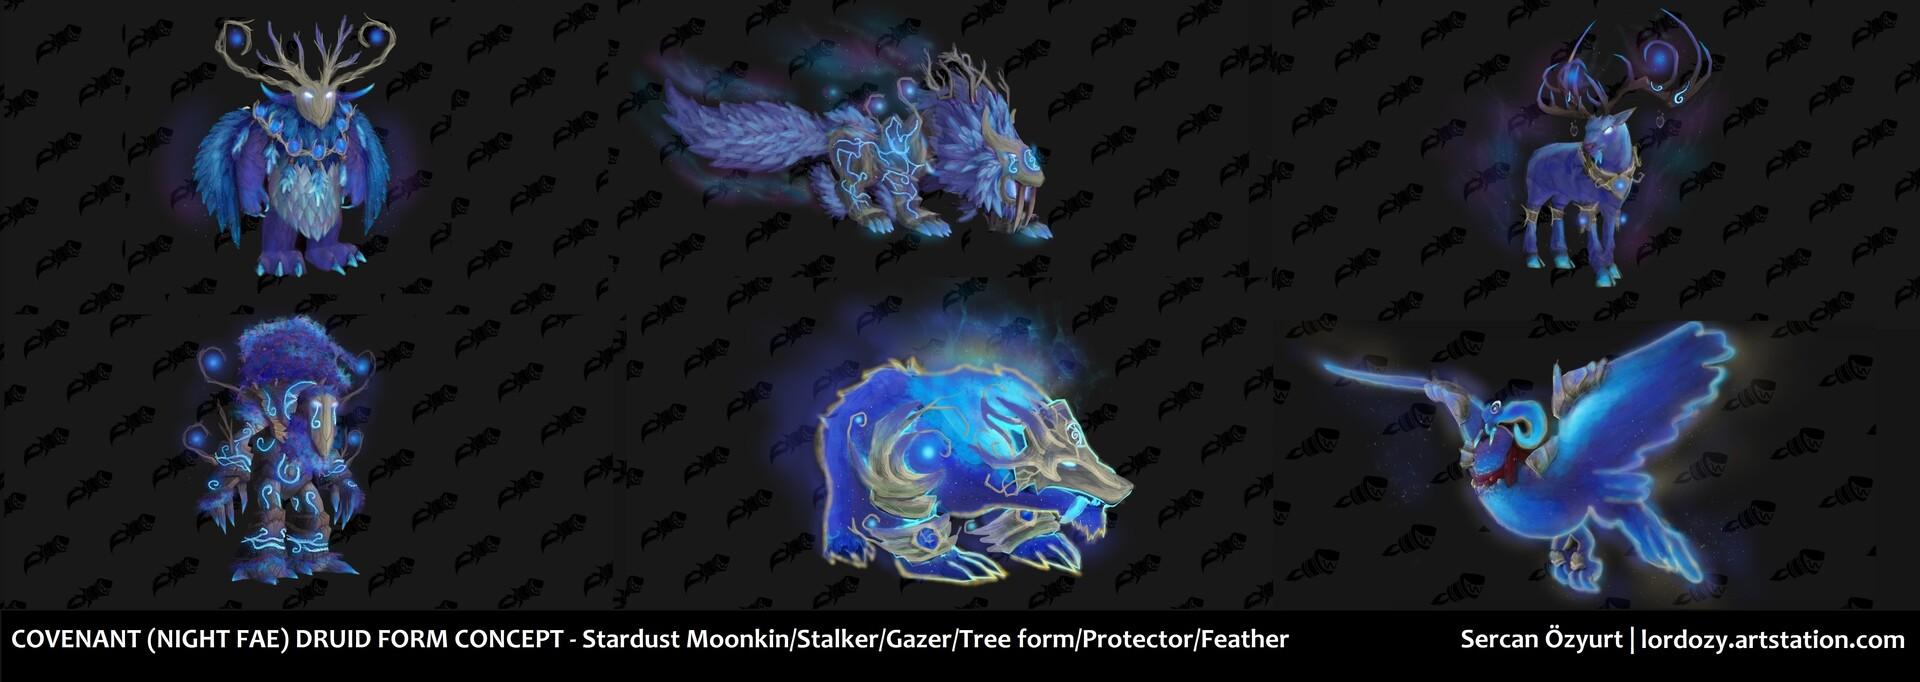 sercan-ozyurt-druidtree18.jpg?1606705557